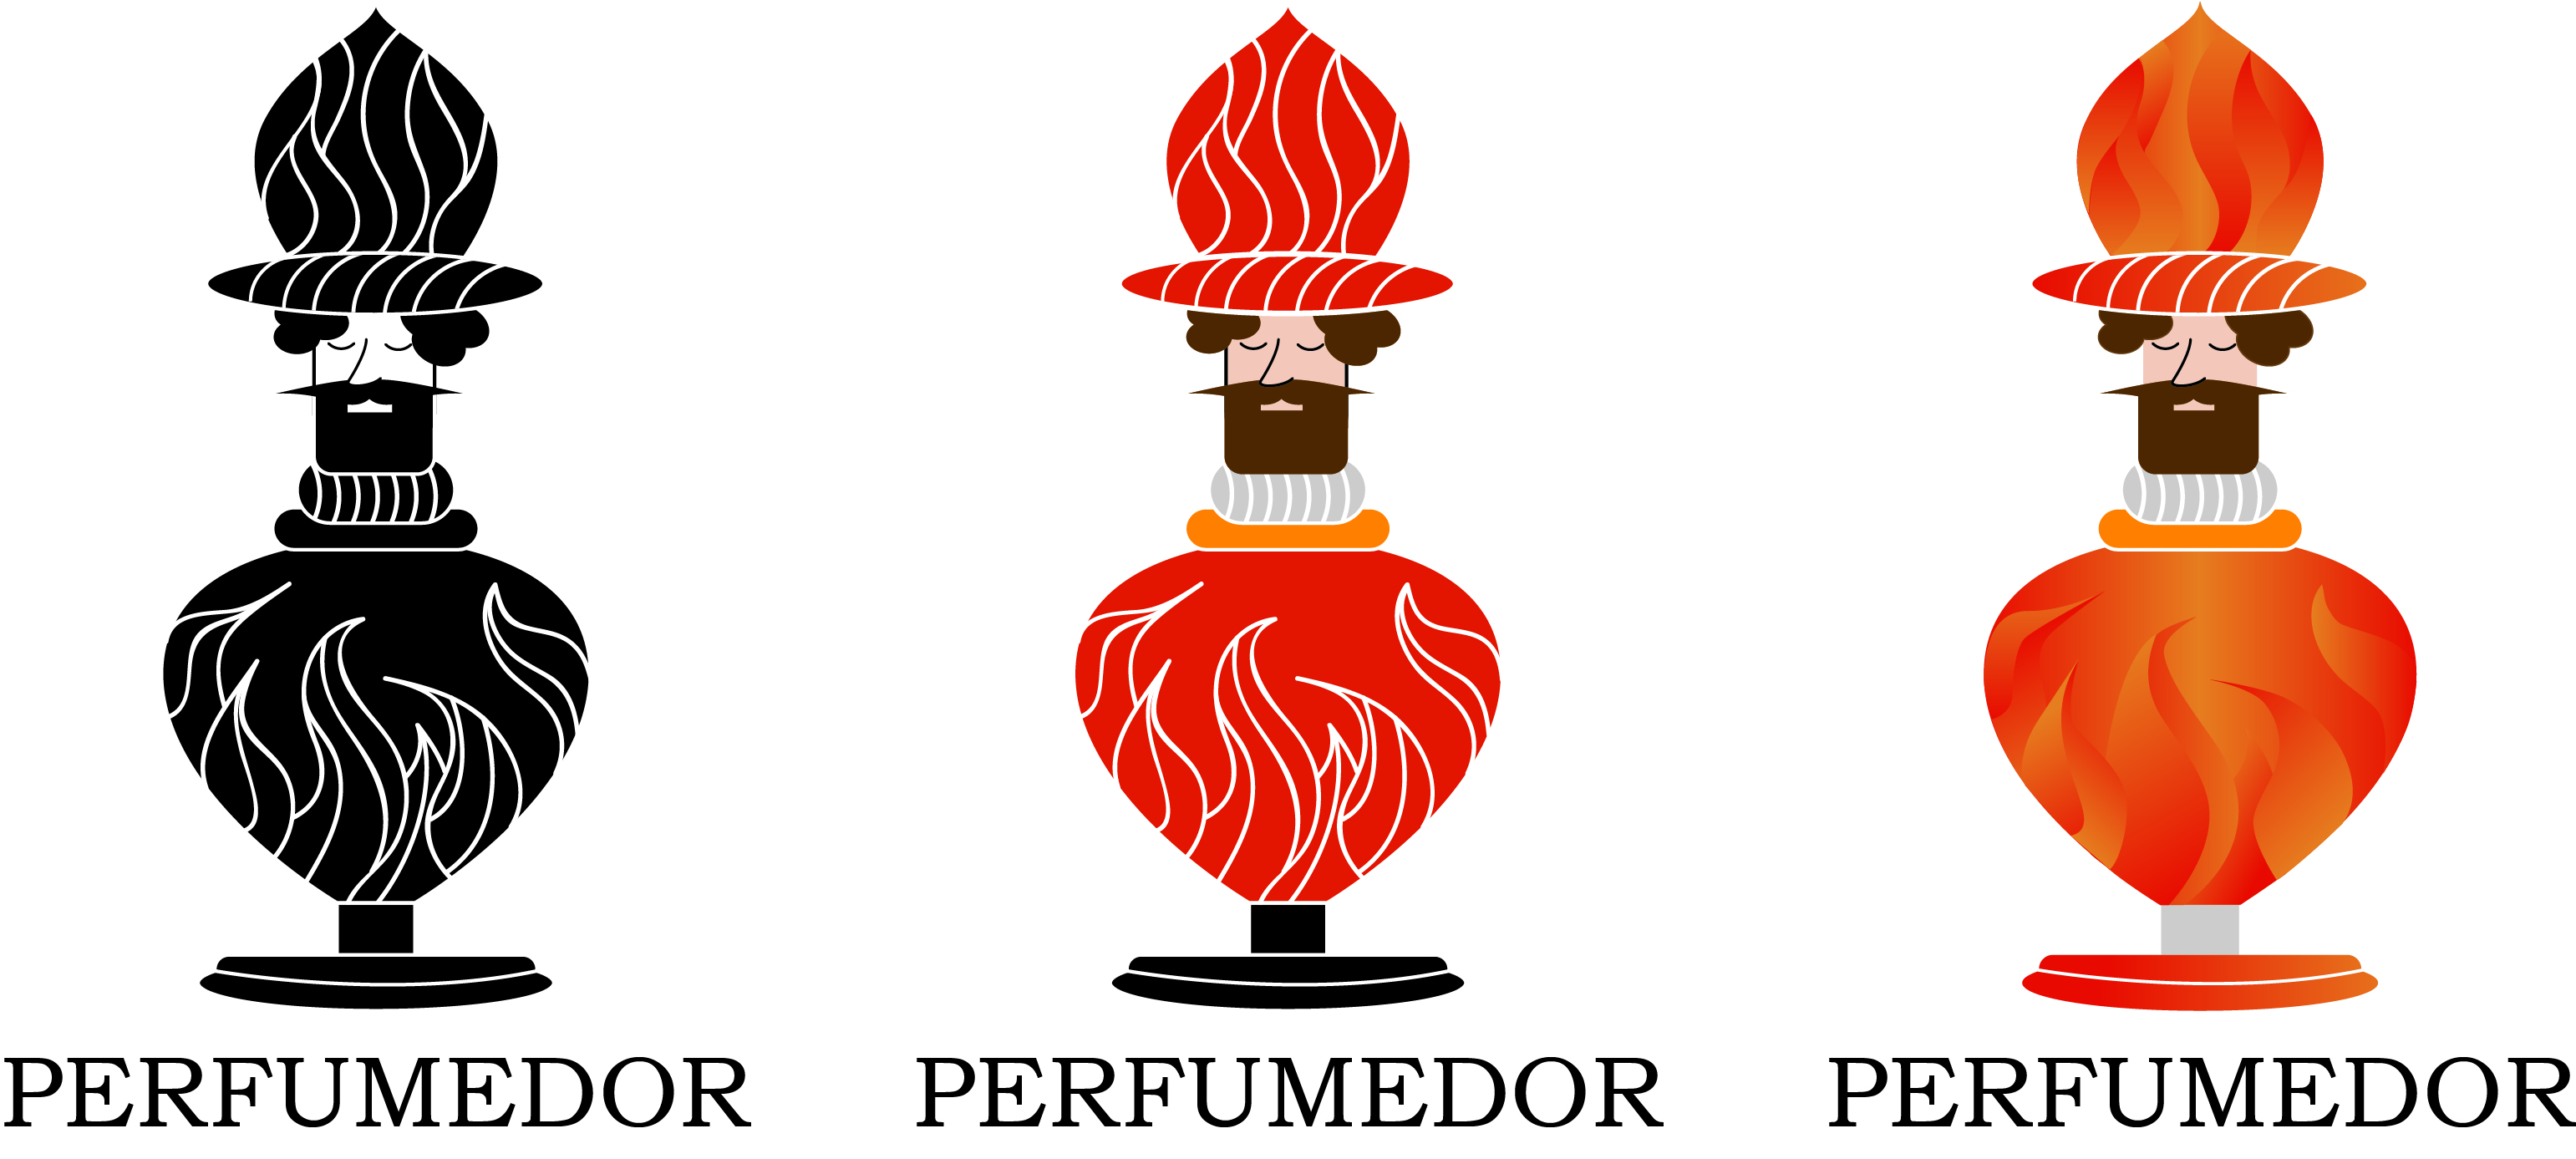 Логотип для интернет-магазина парфюмерии фото f_5635b4a0baf668d4.jpg